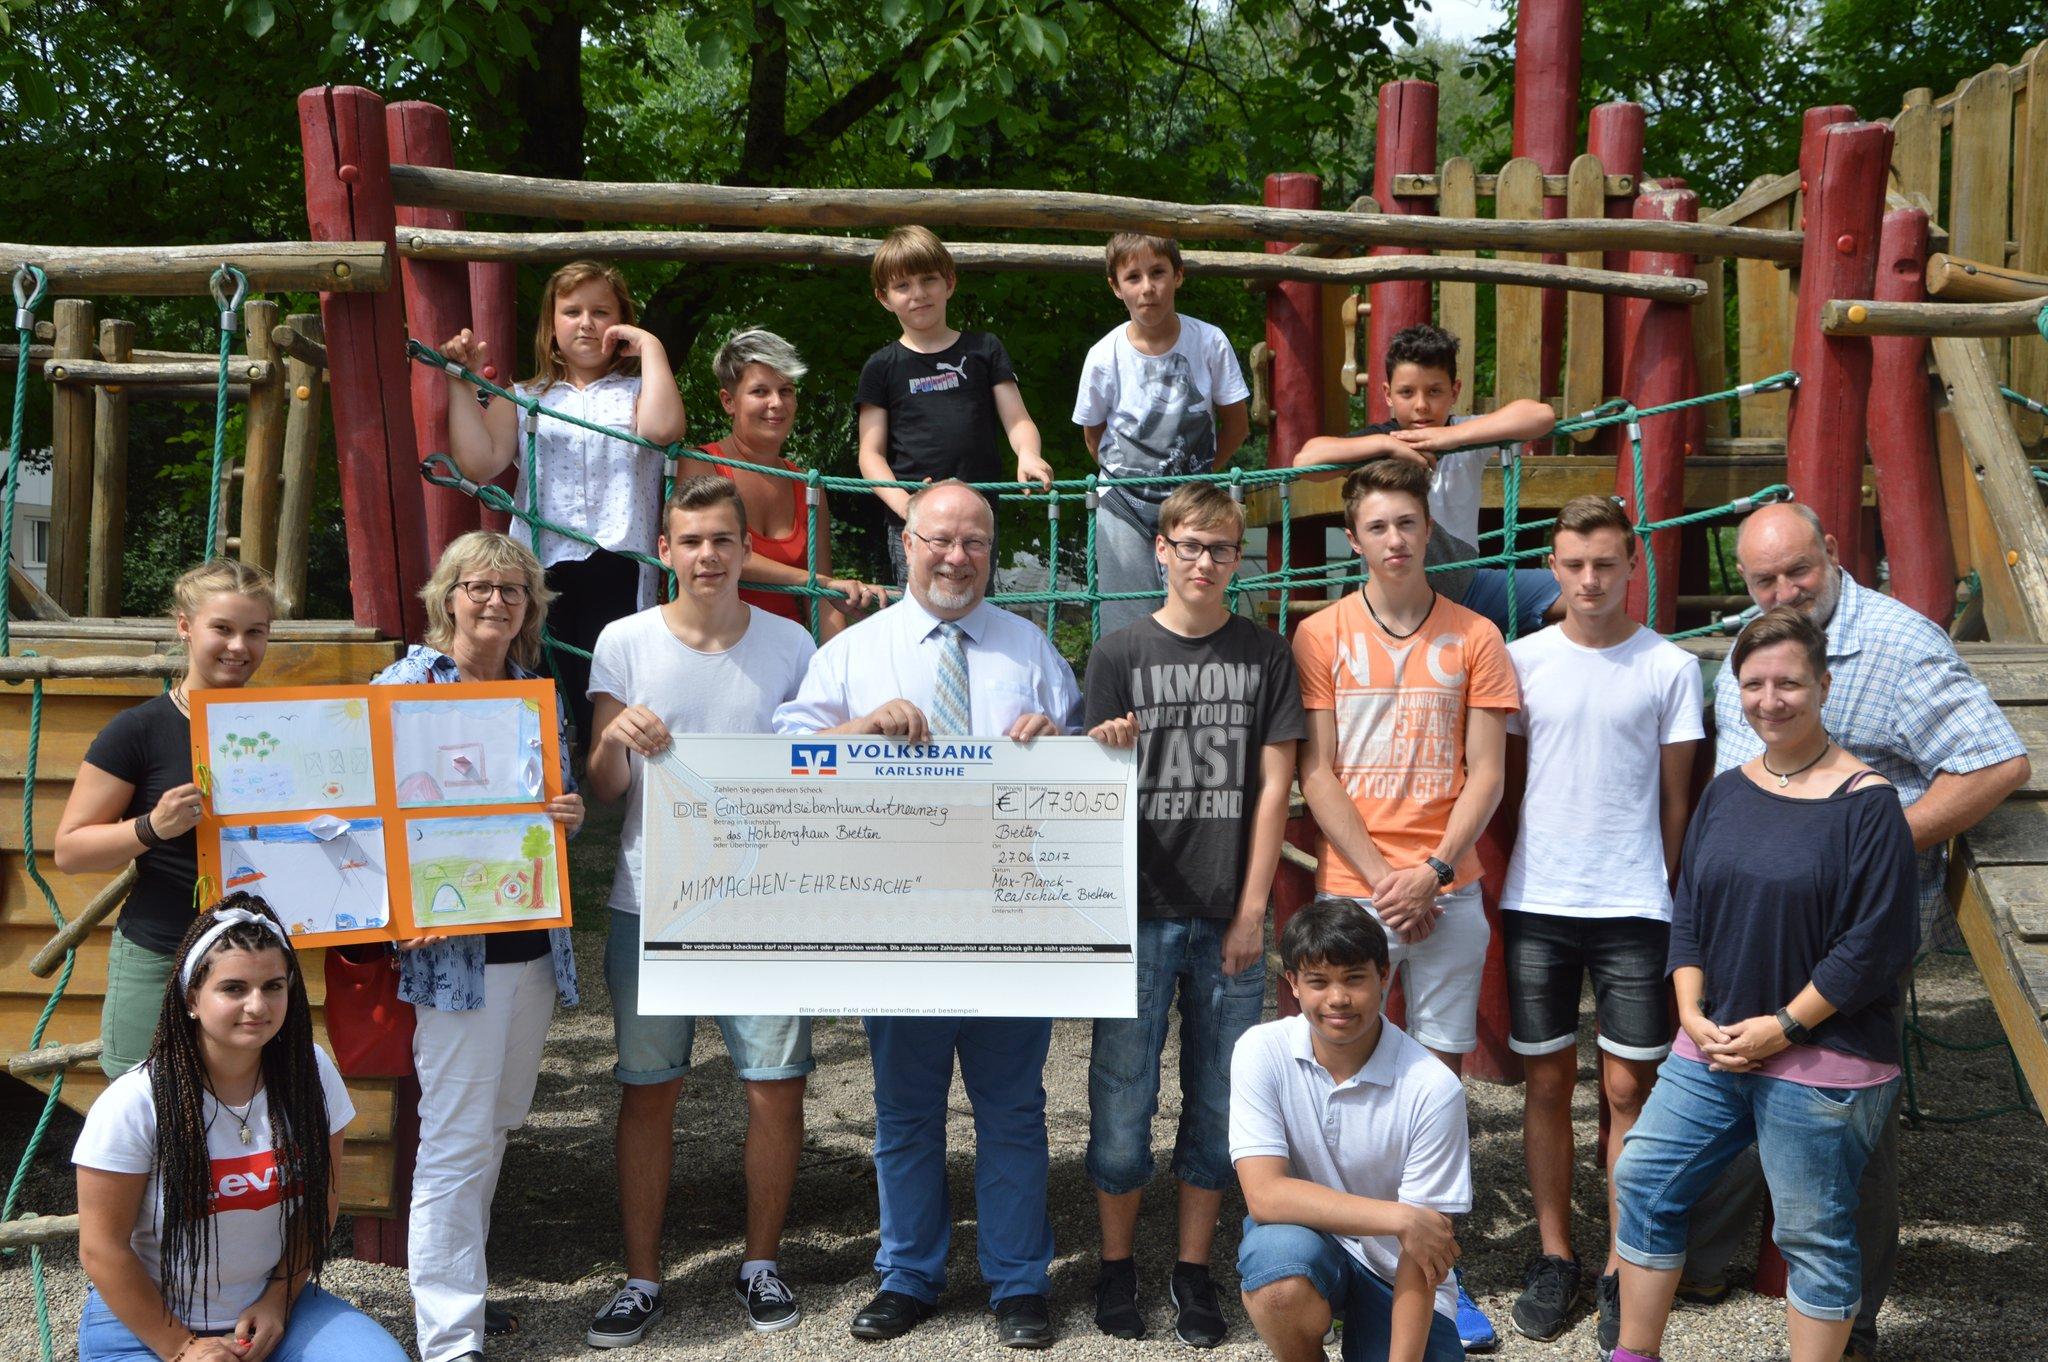 38a55b9acdebe Bretten  Jugendliche der Max-Planck-Realschule spenden Lohn ans Hohberghaus  - Bretten